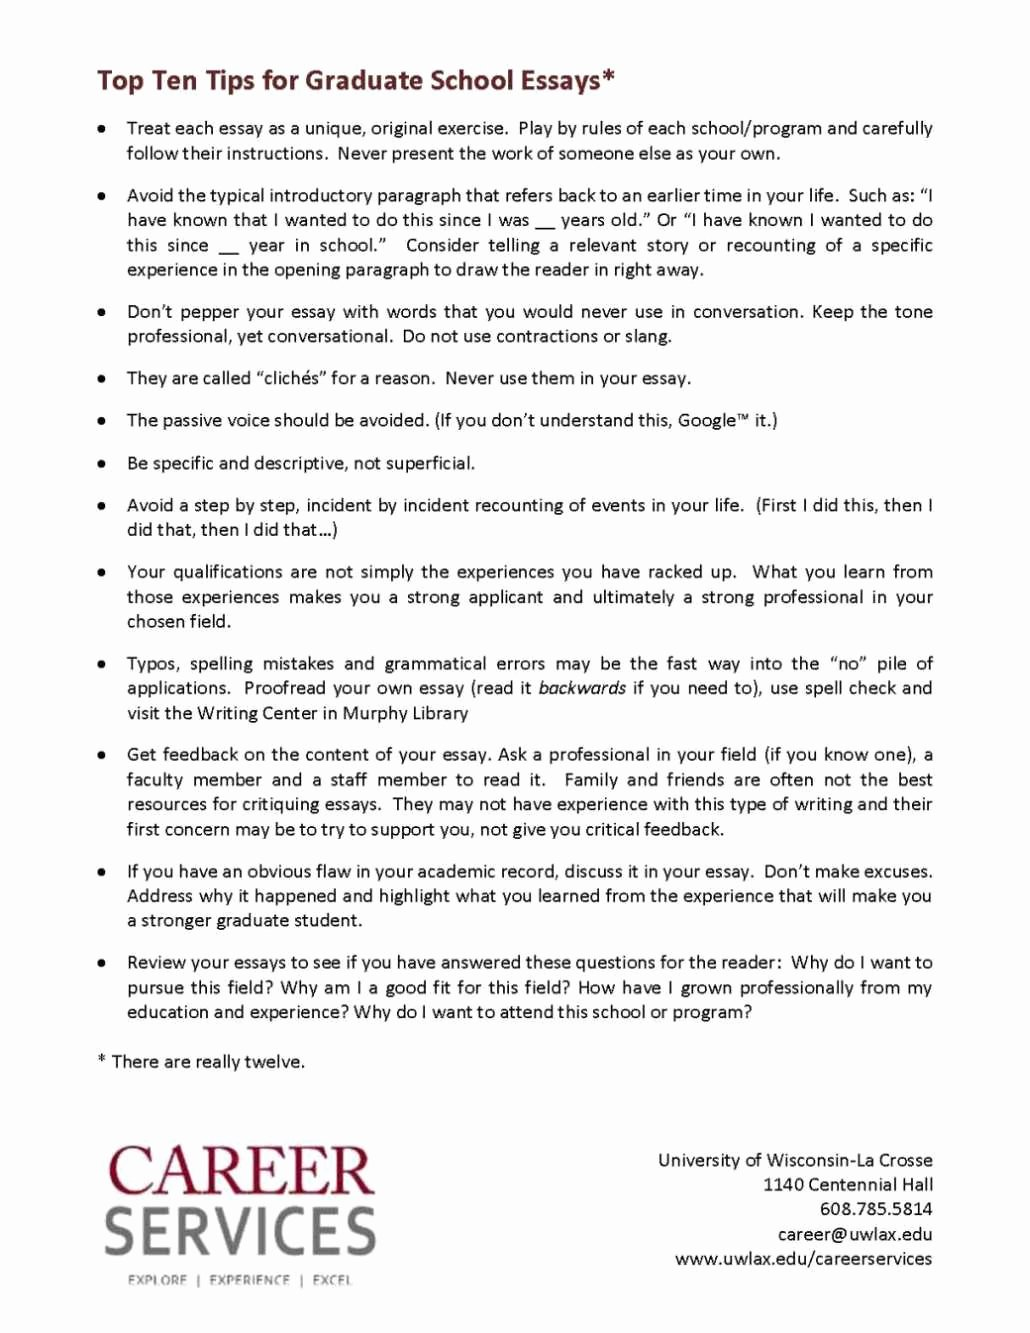 Master Degree Essay Examples New Graduate Degree Admission Essay 2018 2019 Studychacha